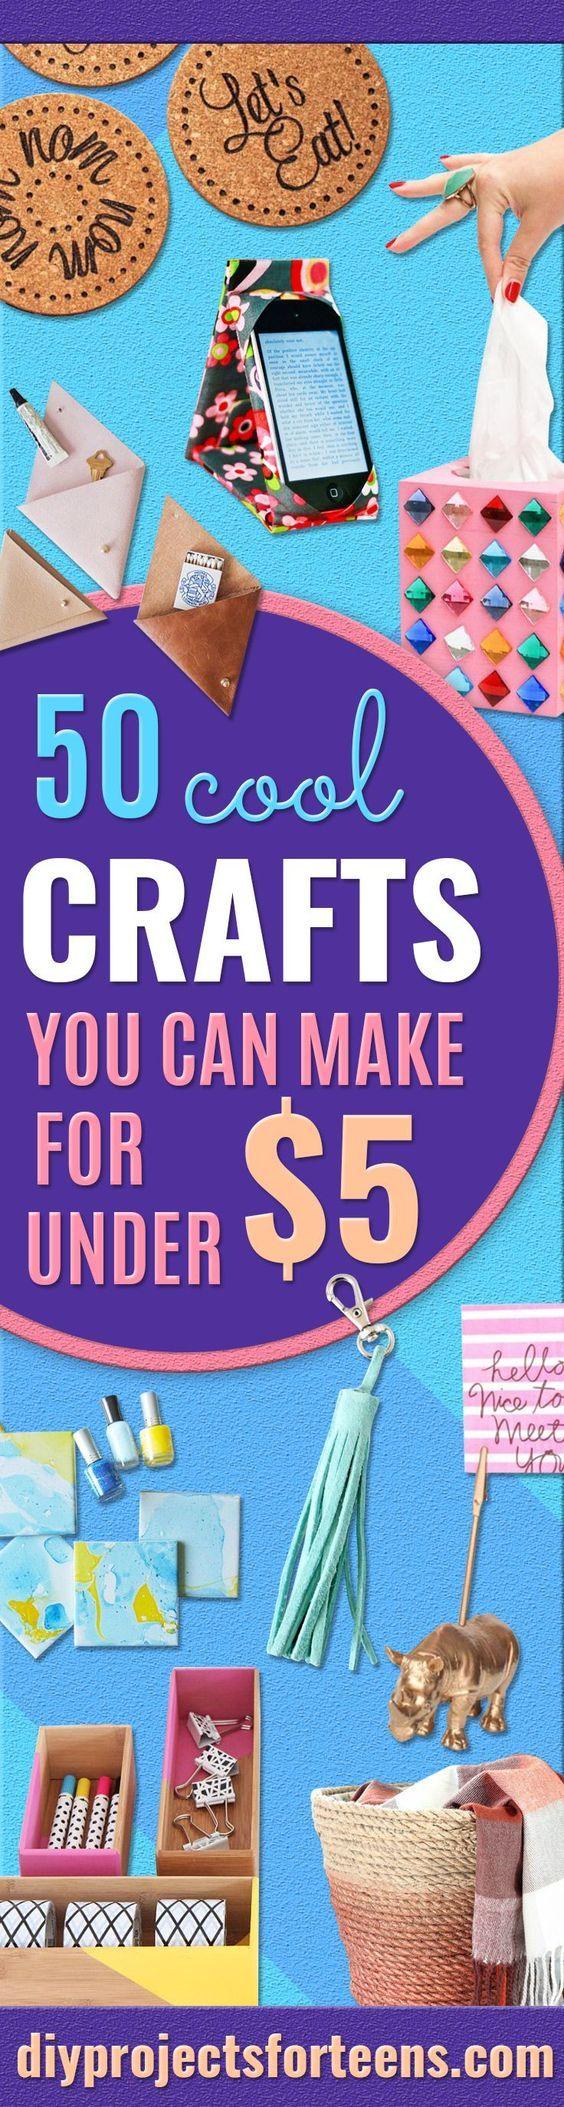 50++ Craft kits for tweens australia ideas in 2021